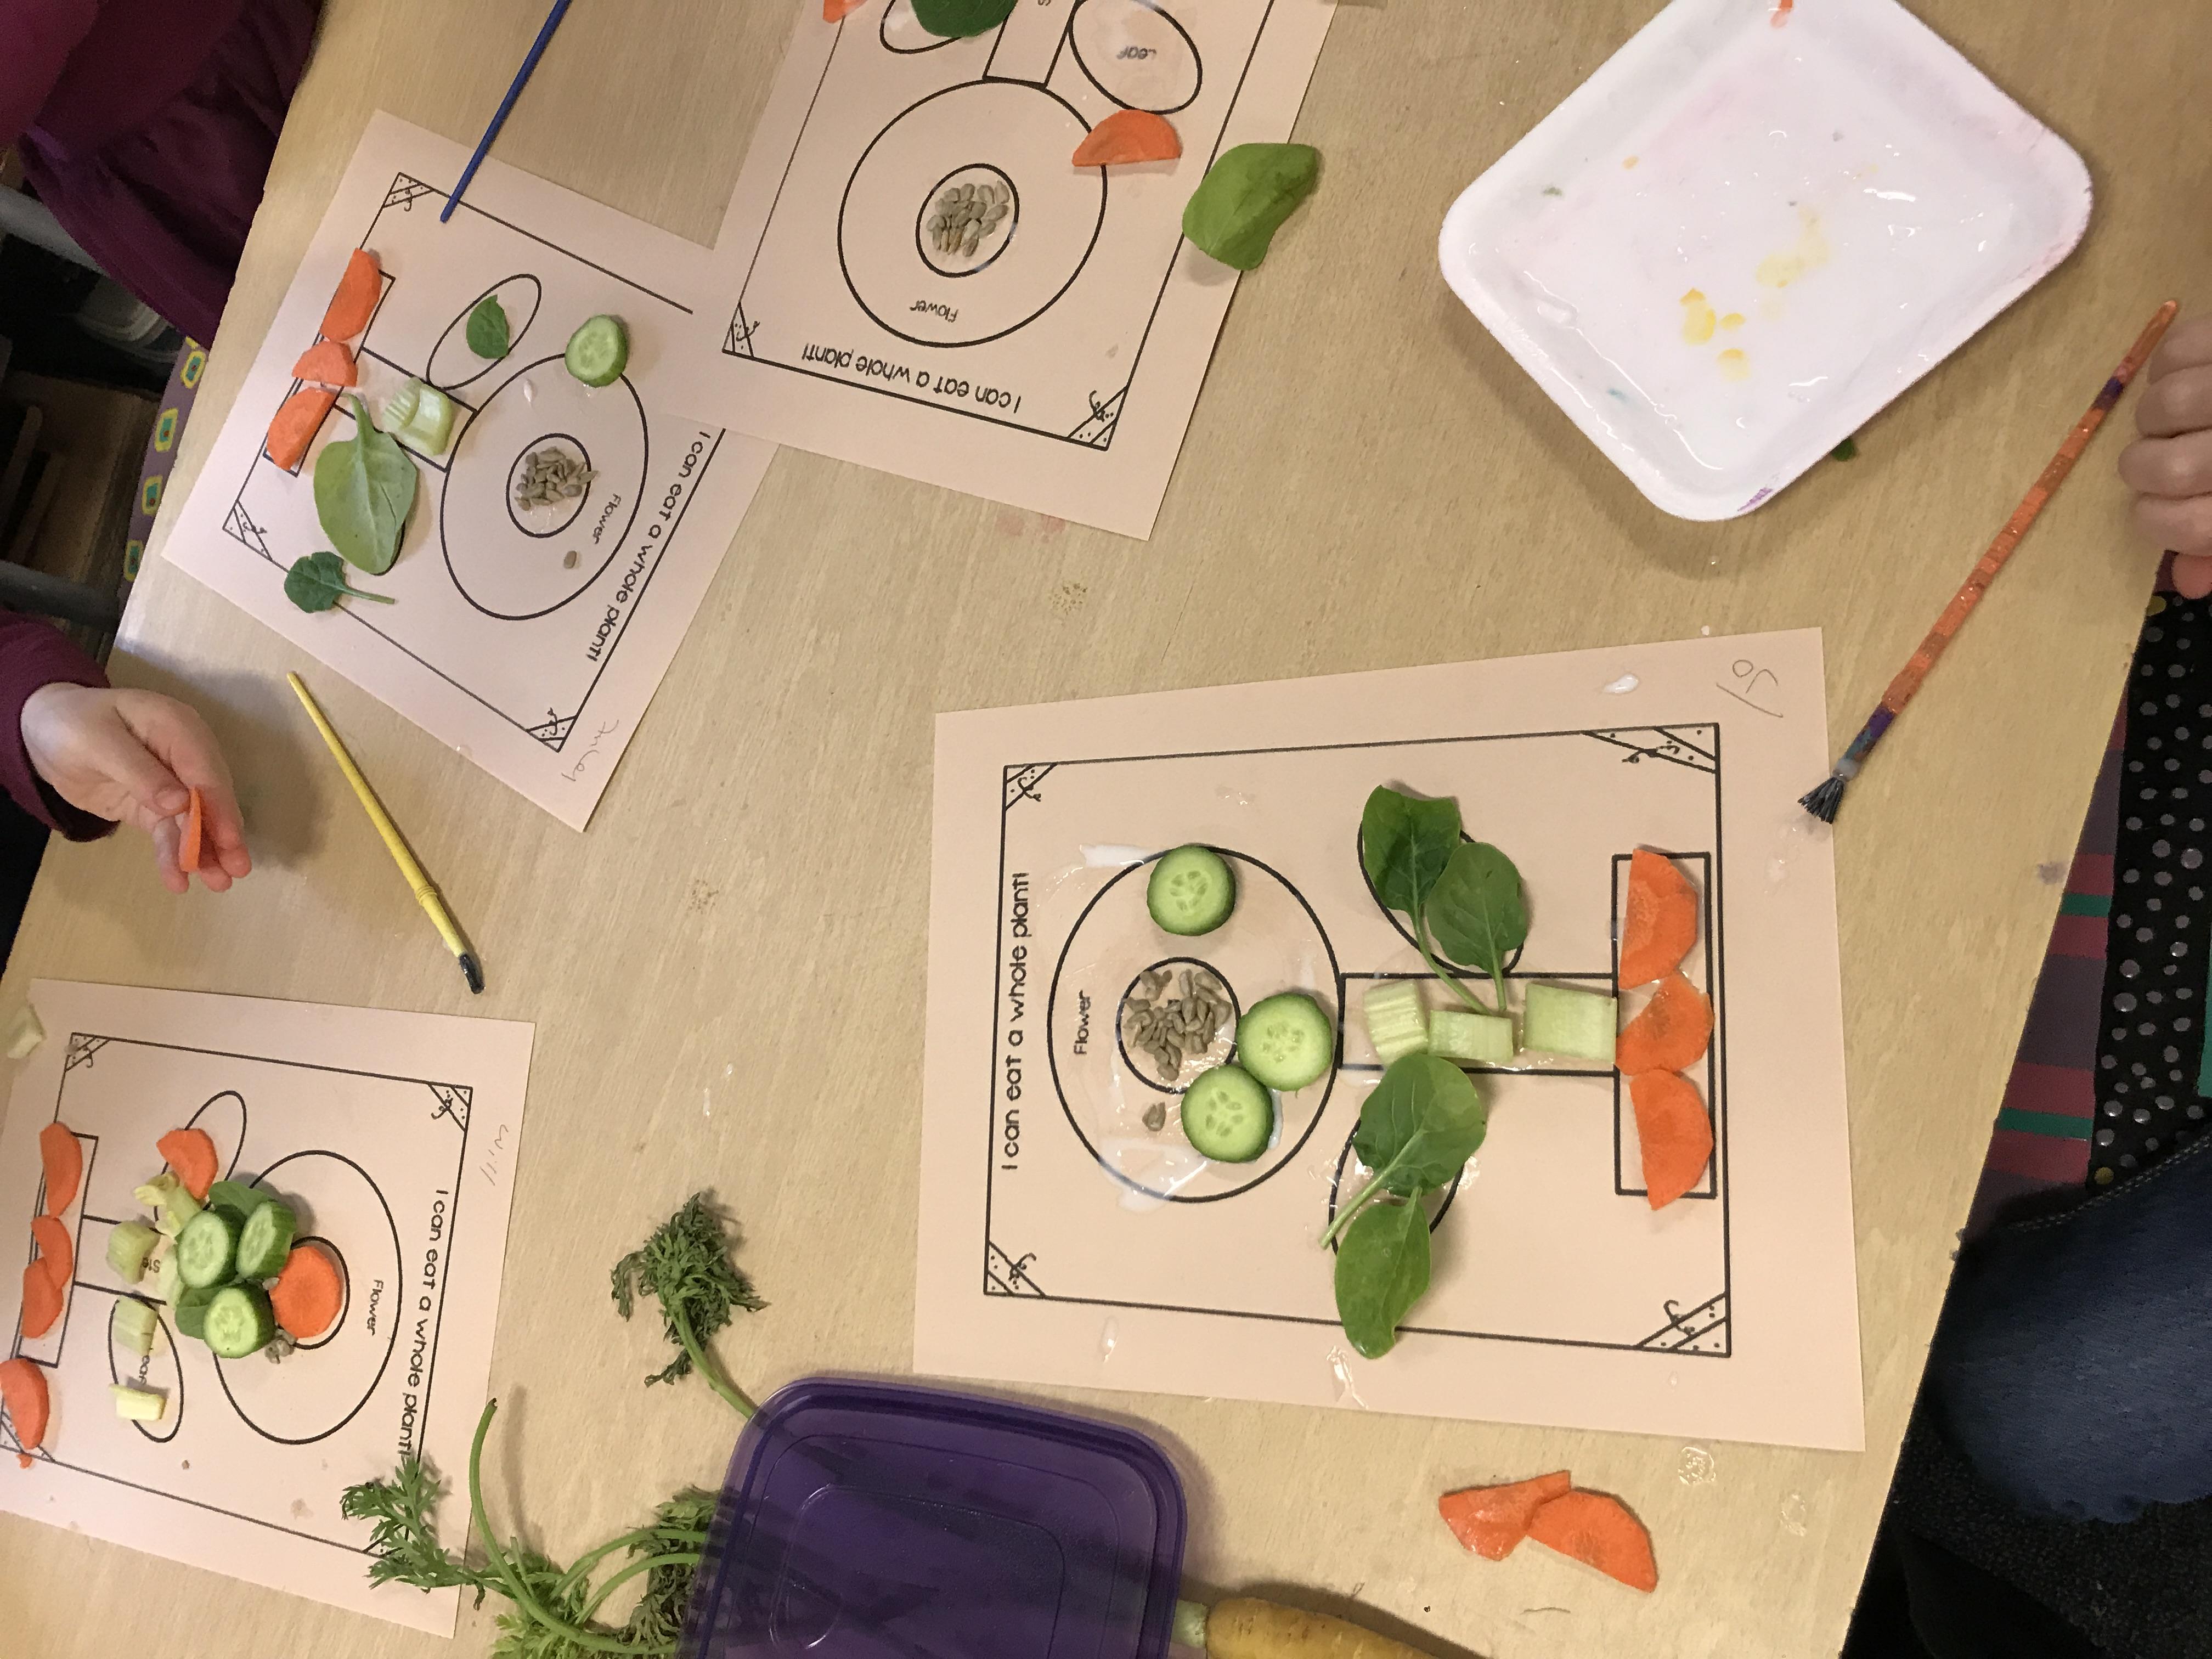 kids art work using cut up vegetables